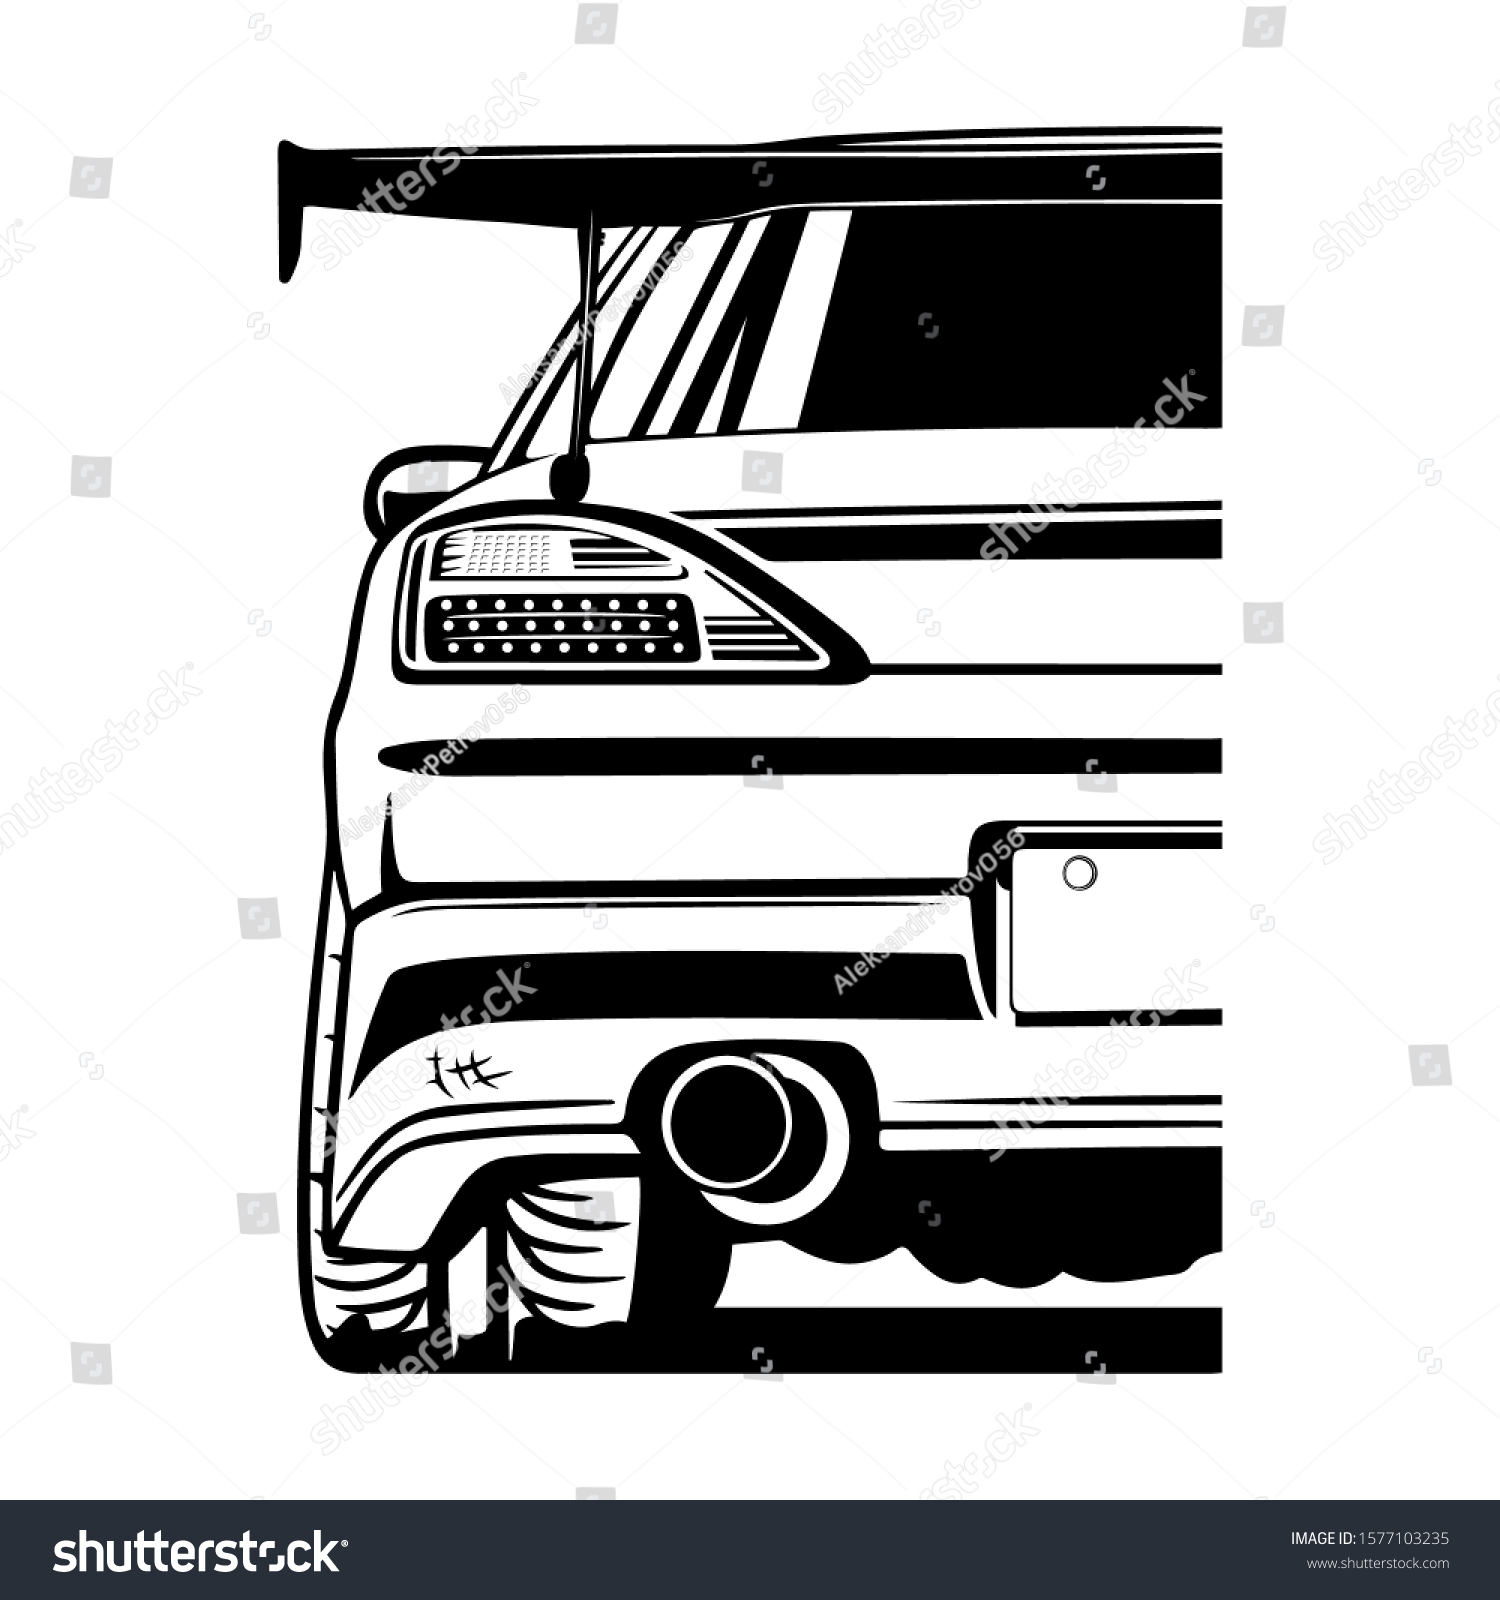 vector japans draft cars silvia s15 stock vector (royalty free) 1577103235  shutterstock